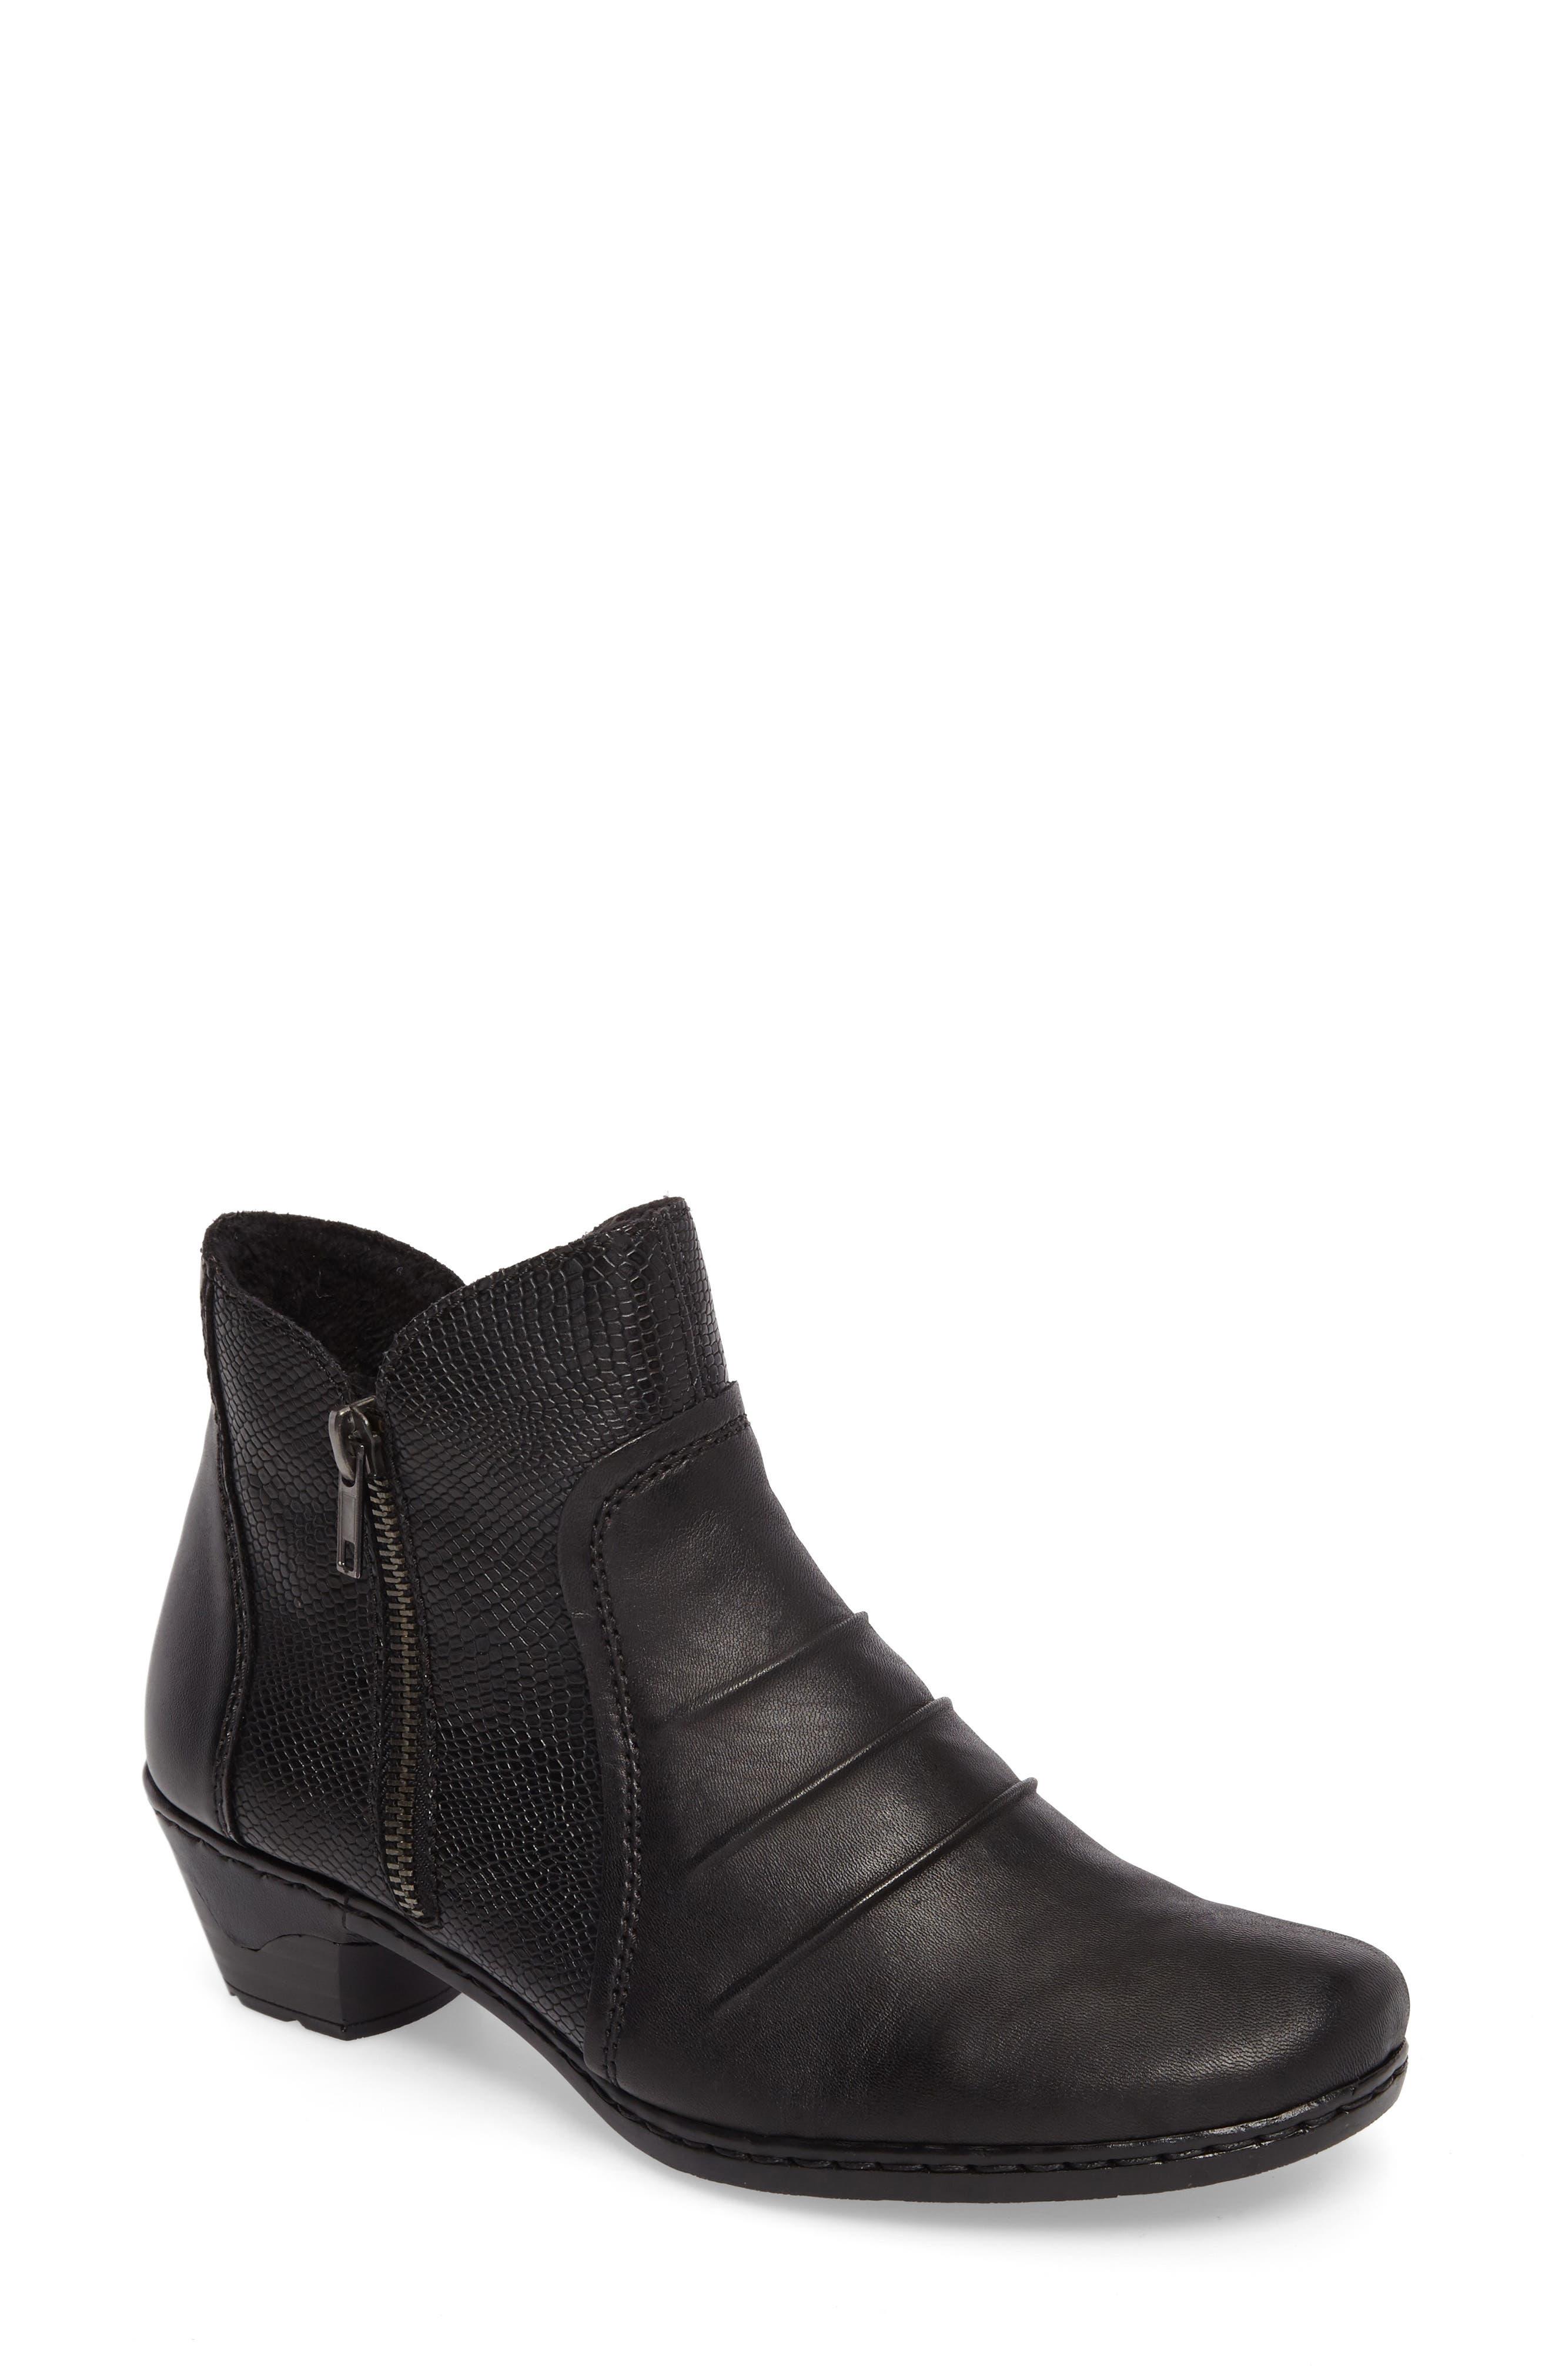 Lynn 62 Bootie,                             Main thumbnail 1, color,                             Schwarz Nero Leather